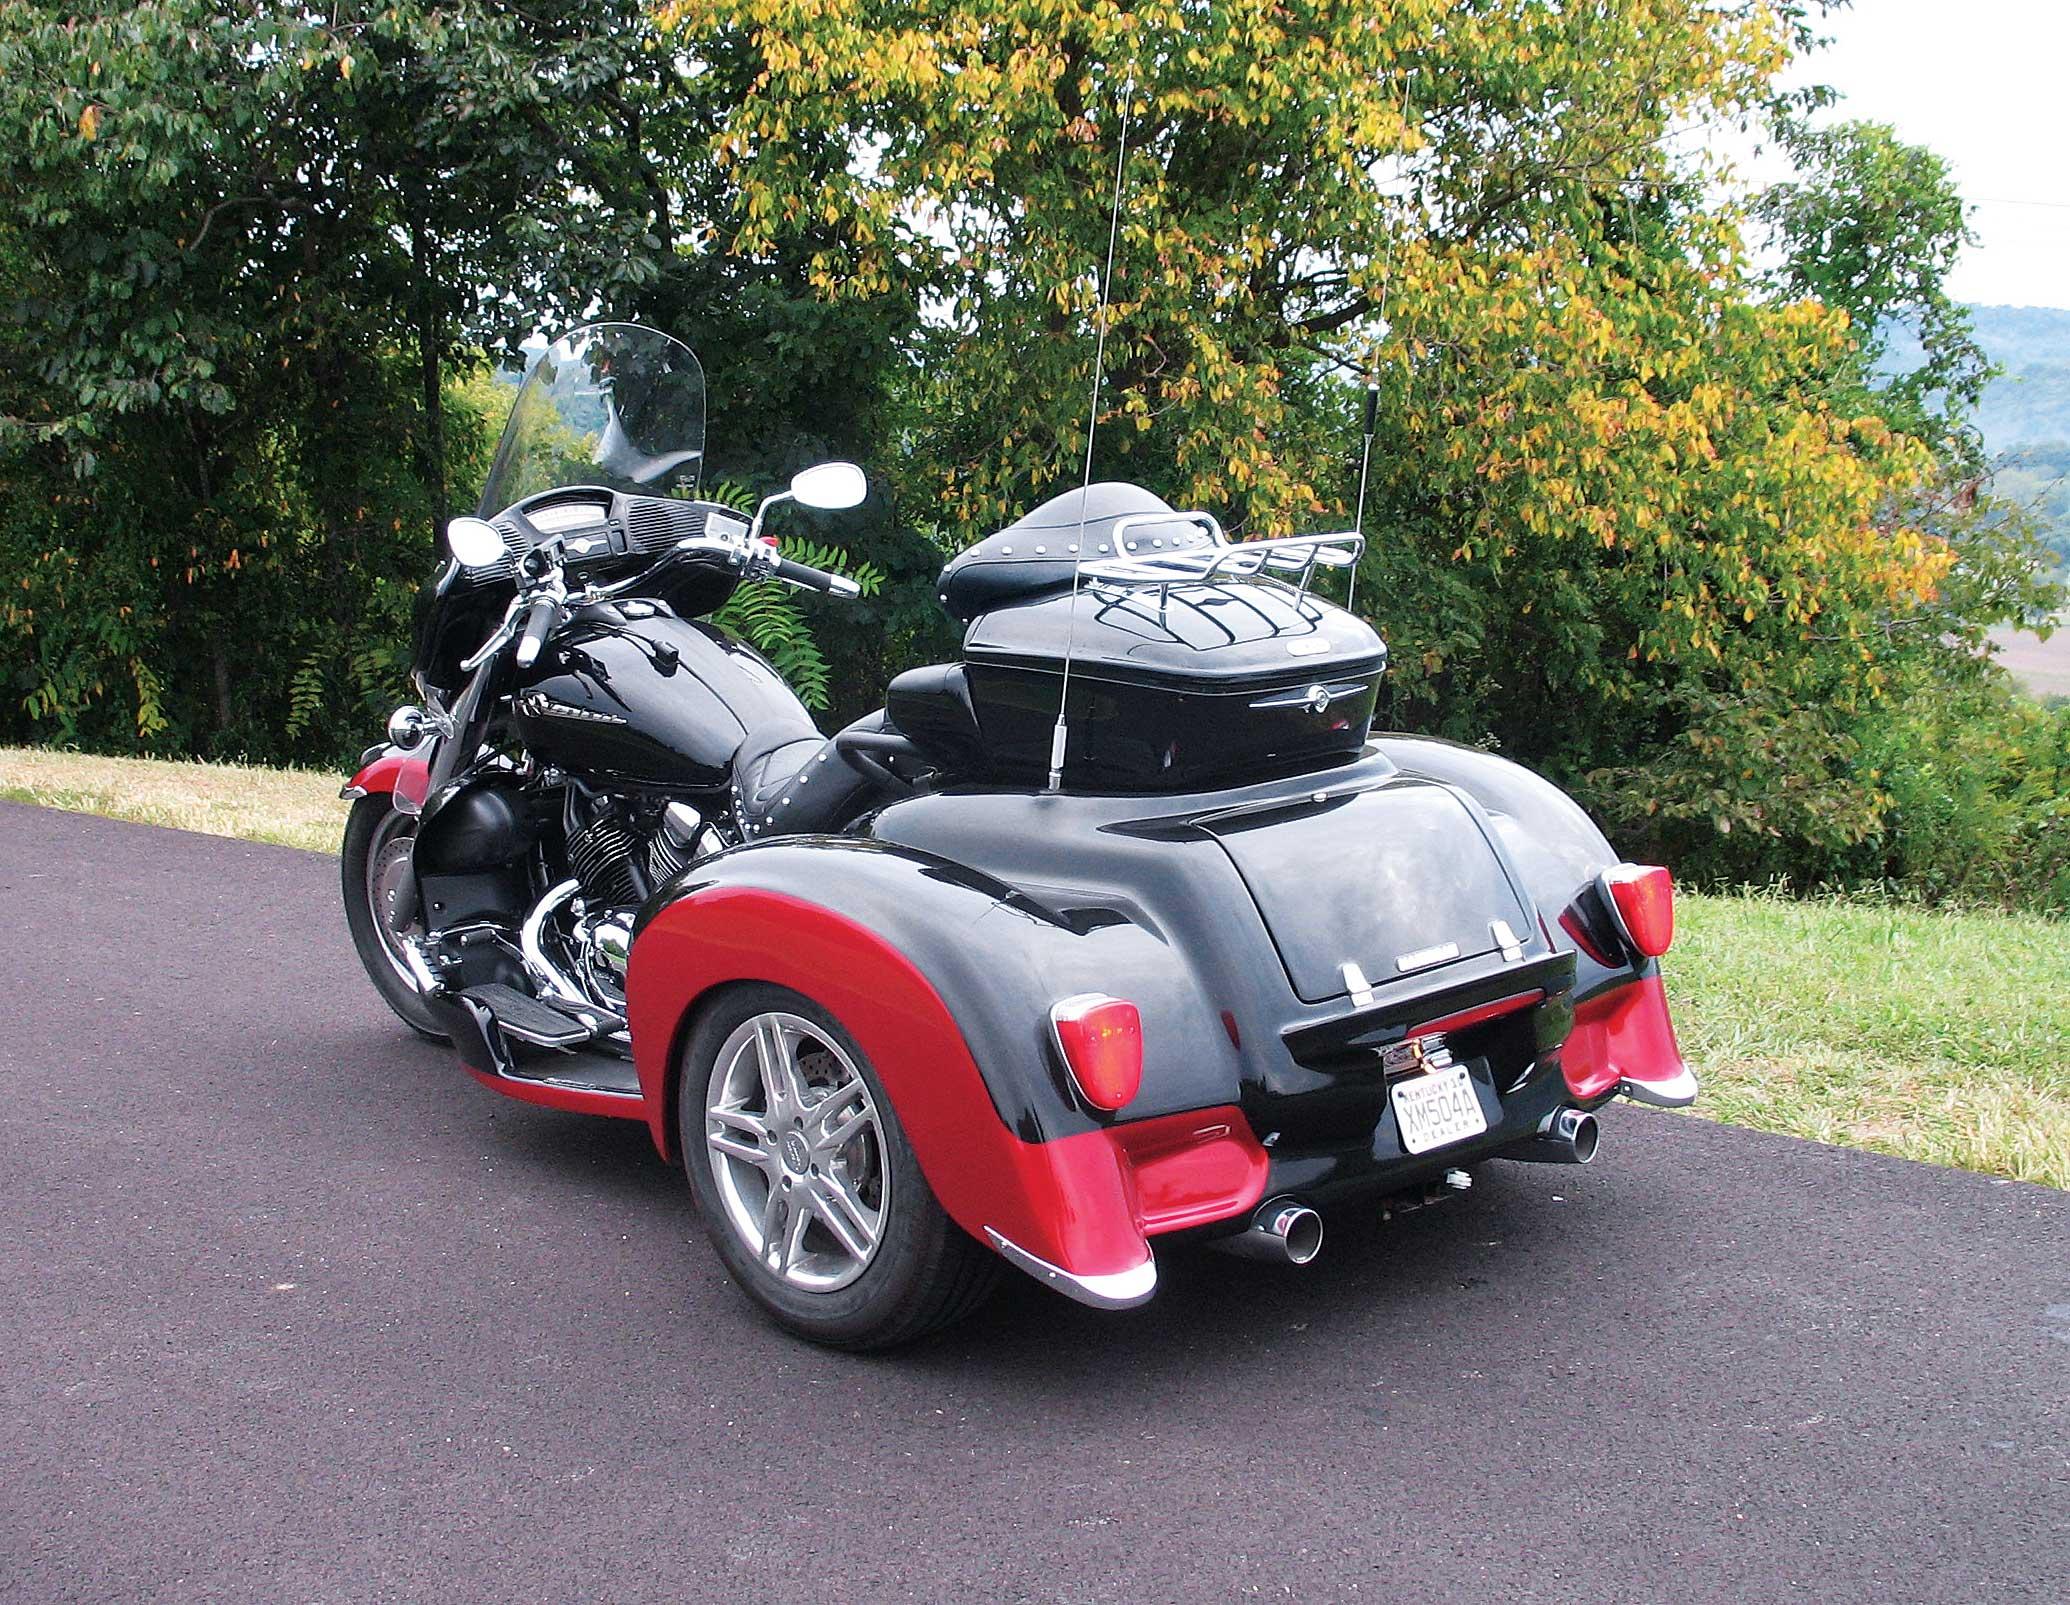 Yamaha Royal Star Venture Hannigan Trike Conversion Rider Magazine Rider Magazine